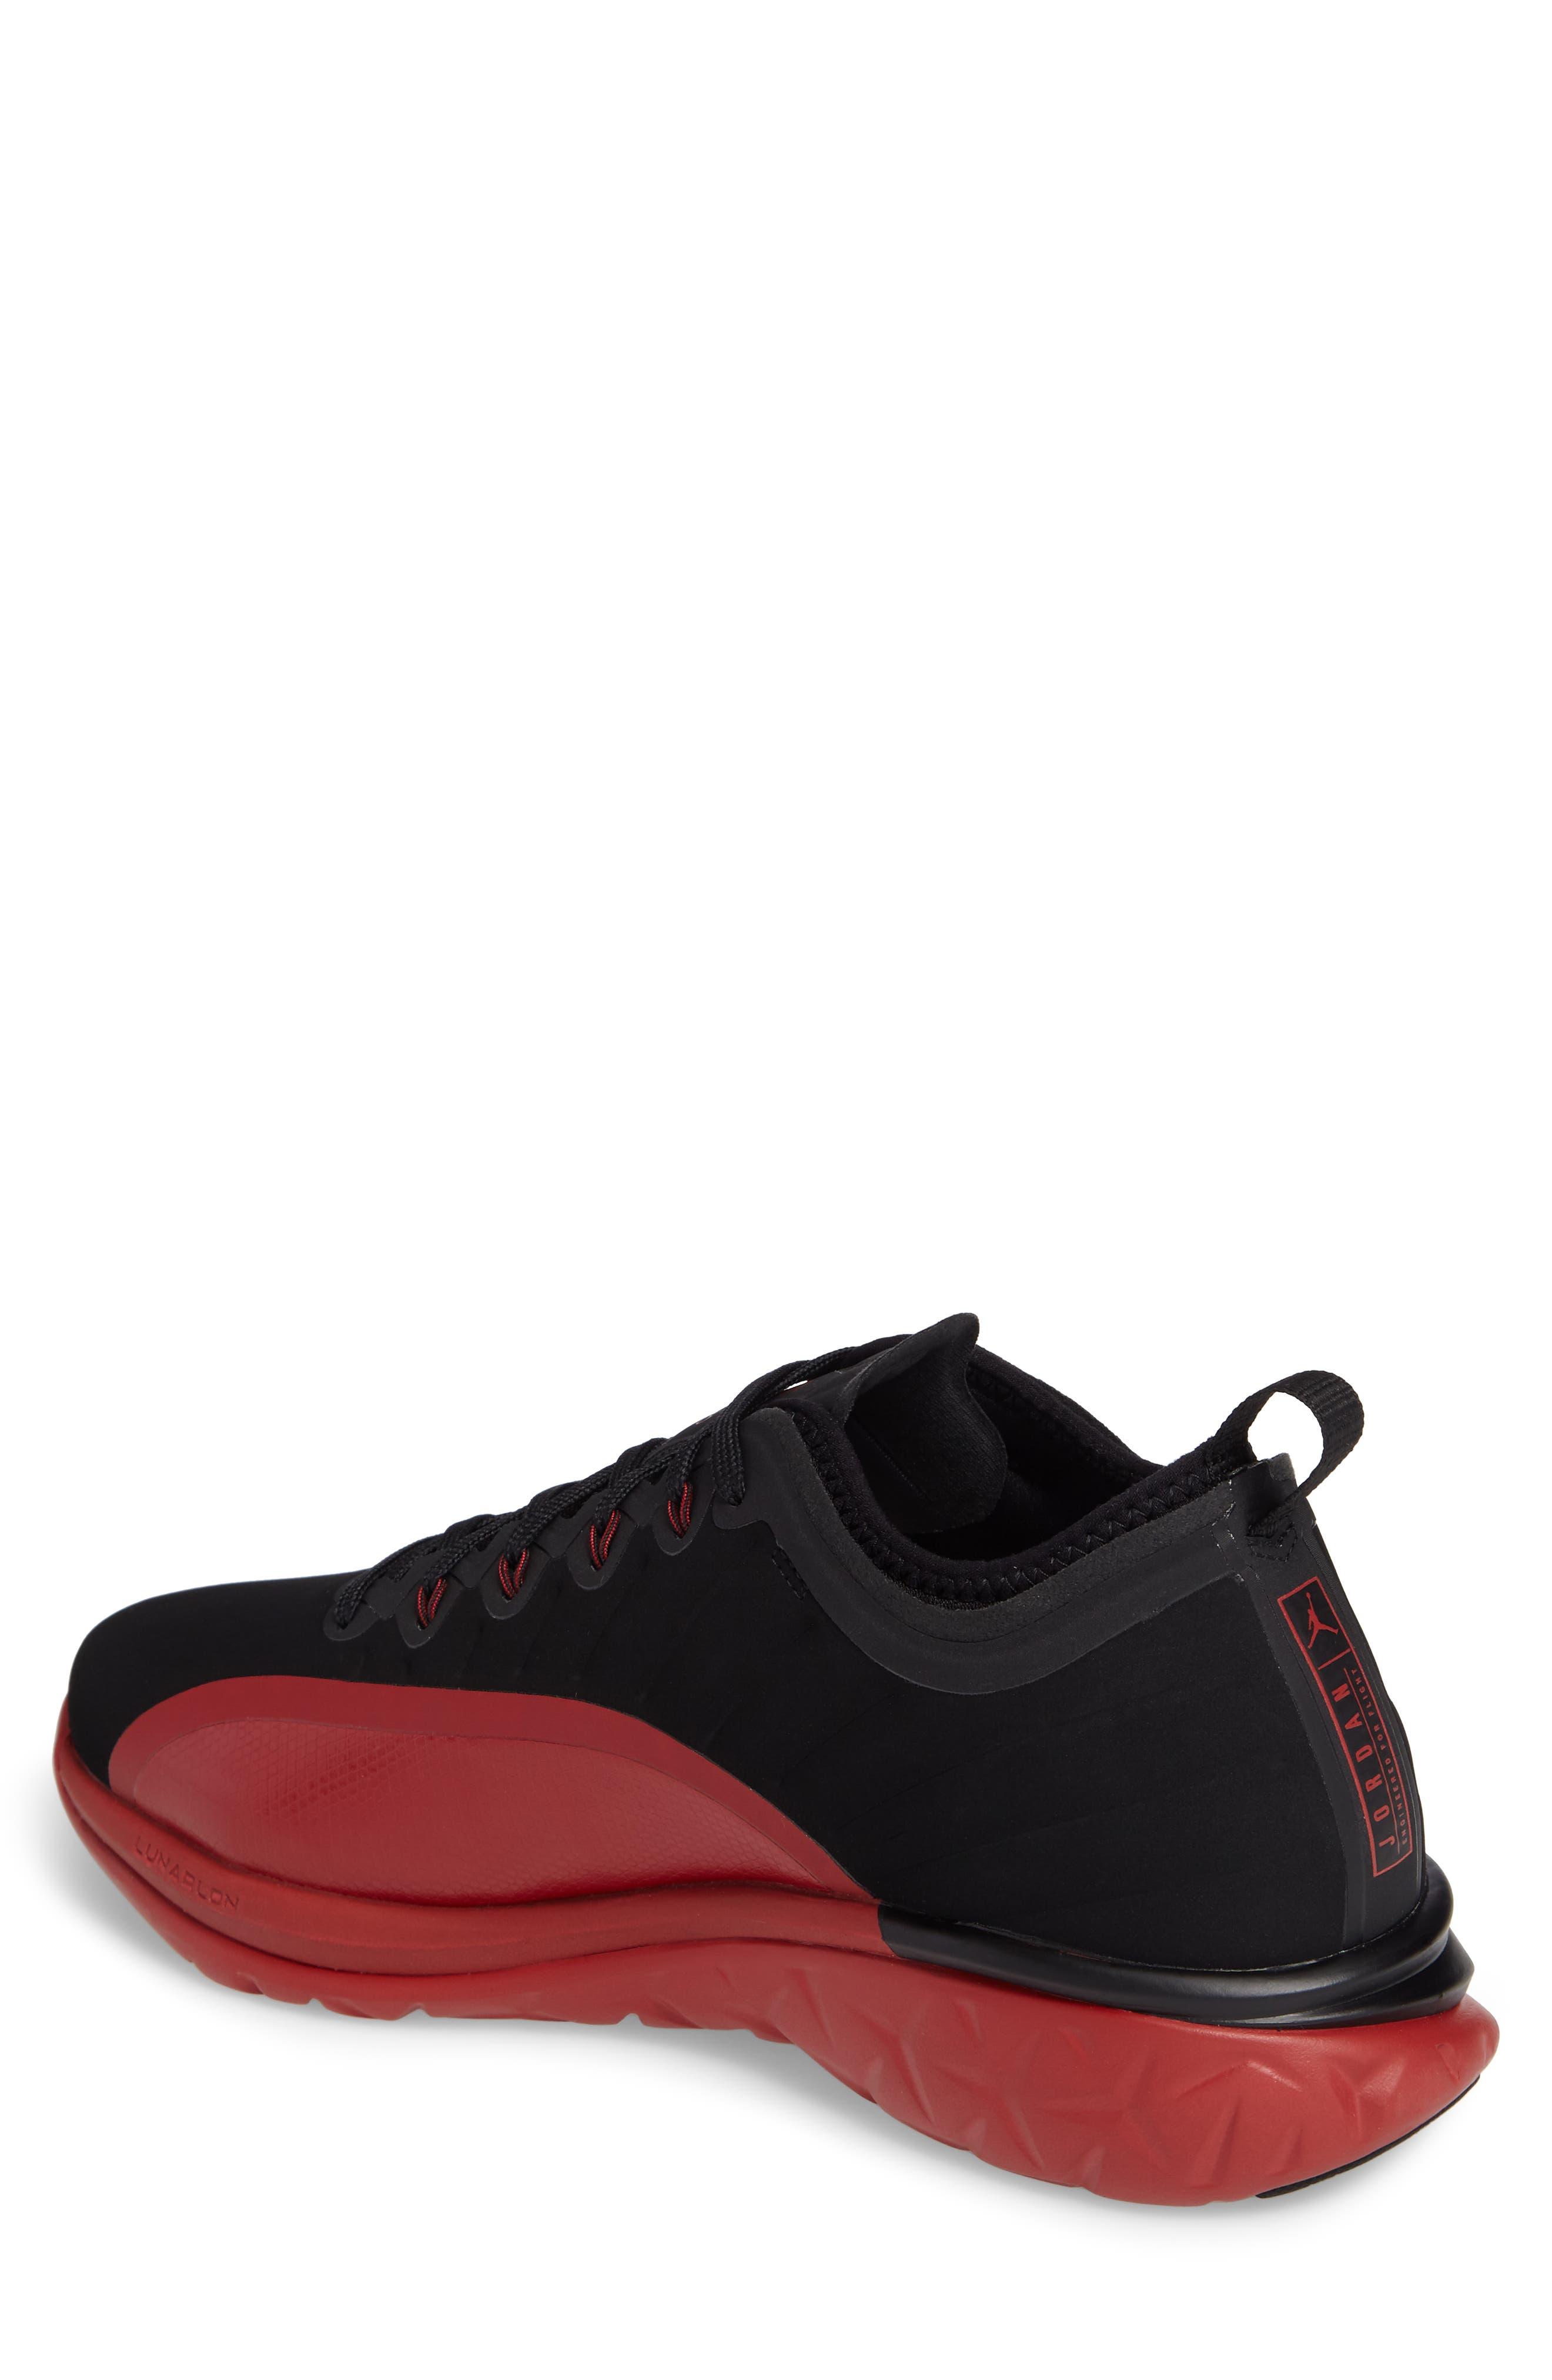 Jordan Trainer Prime Sneaker,                             Alternate thumbnail 2, color,                             Black/ Black/ Gym Red